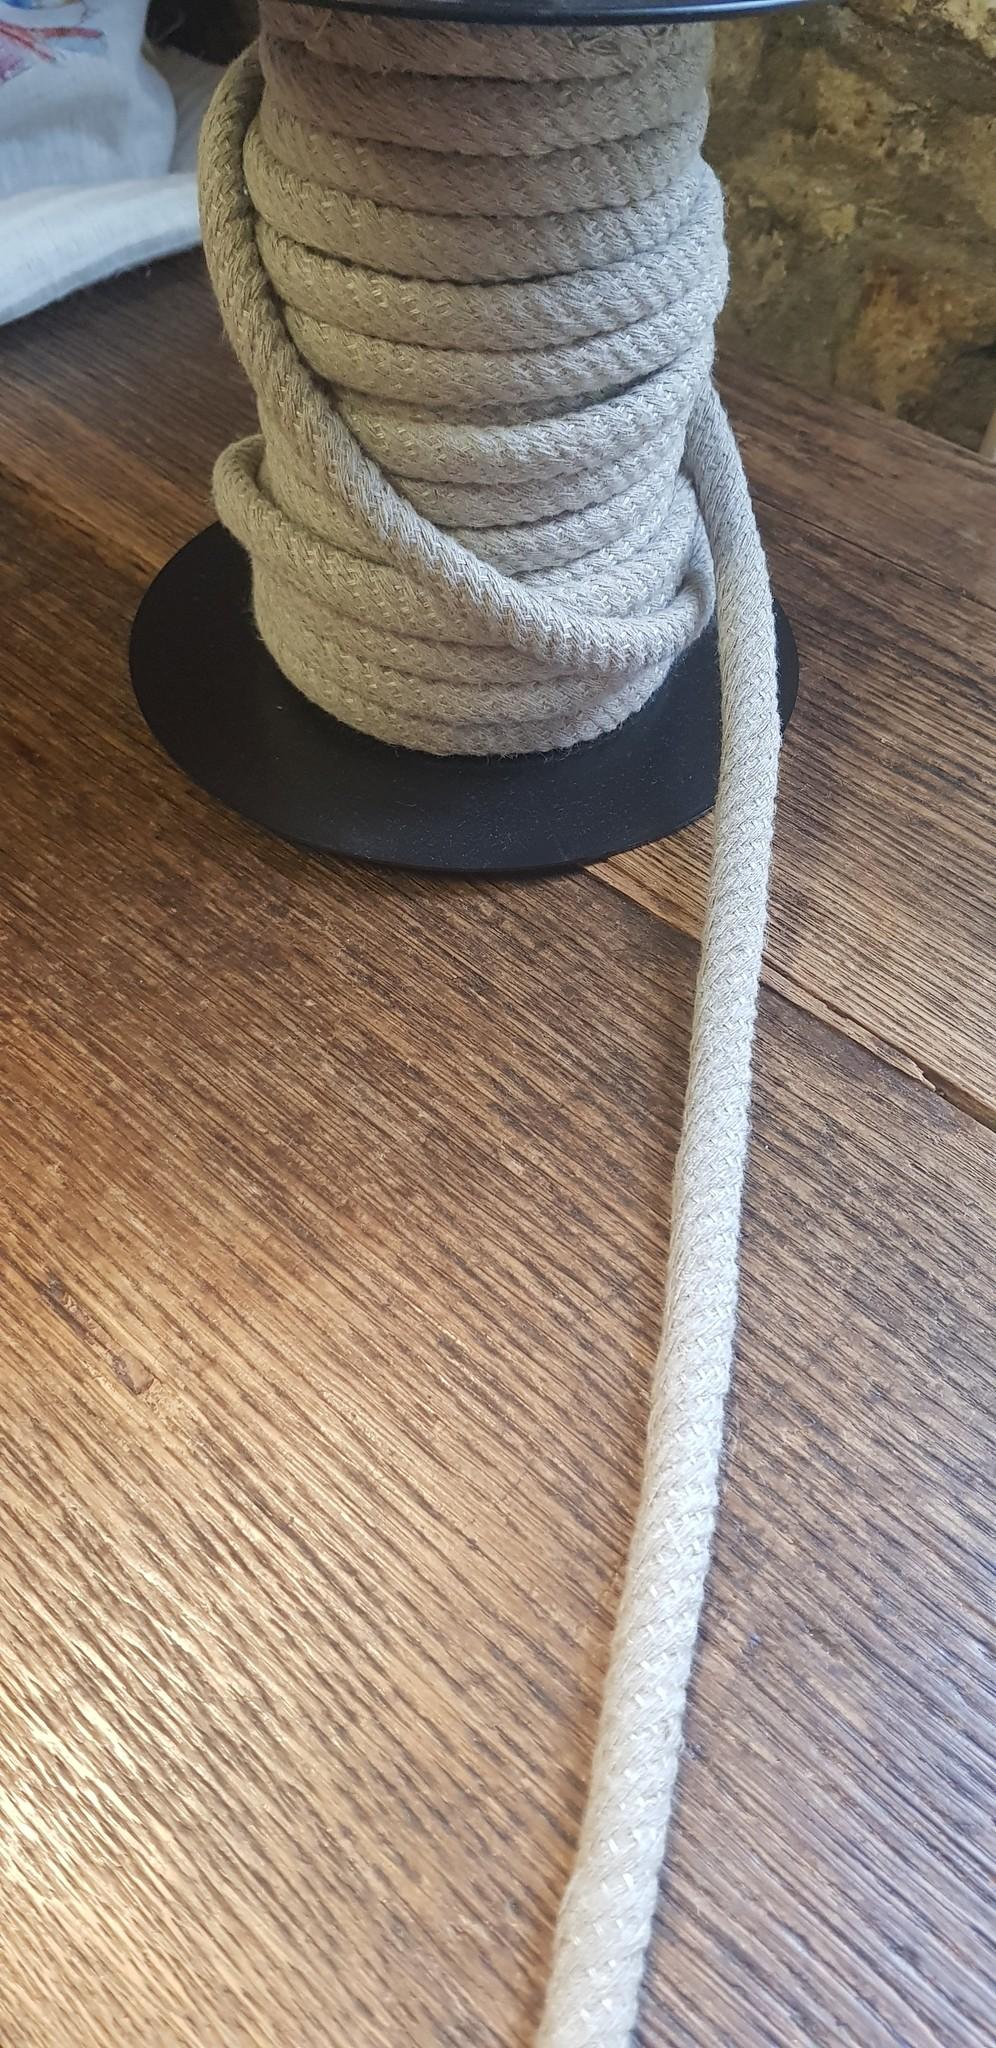 Le grenier du lin corde pur lin